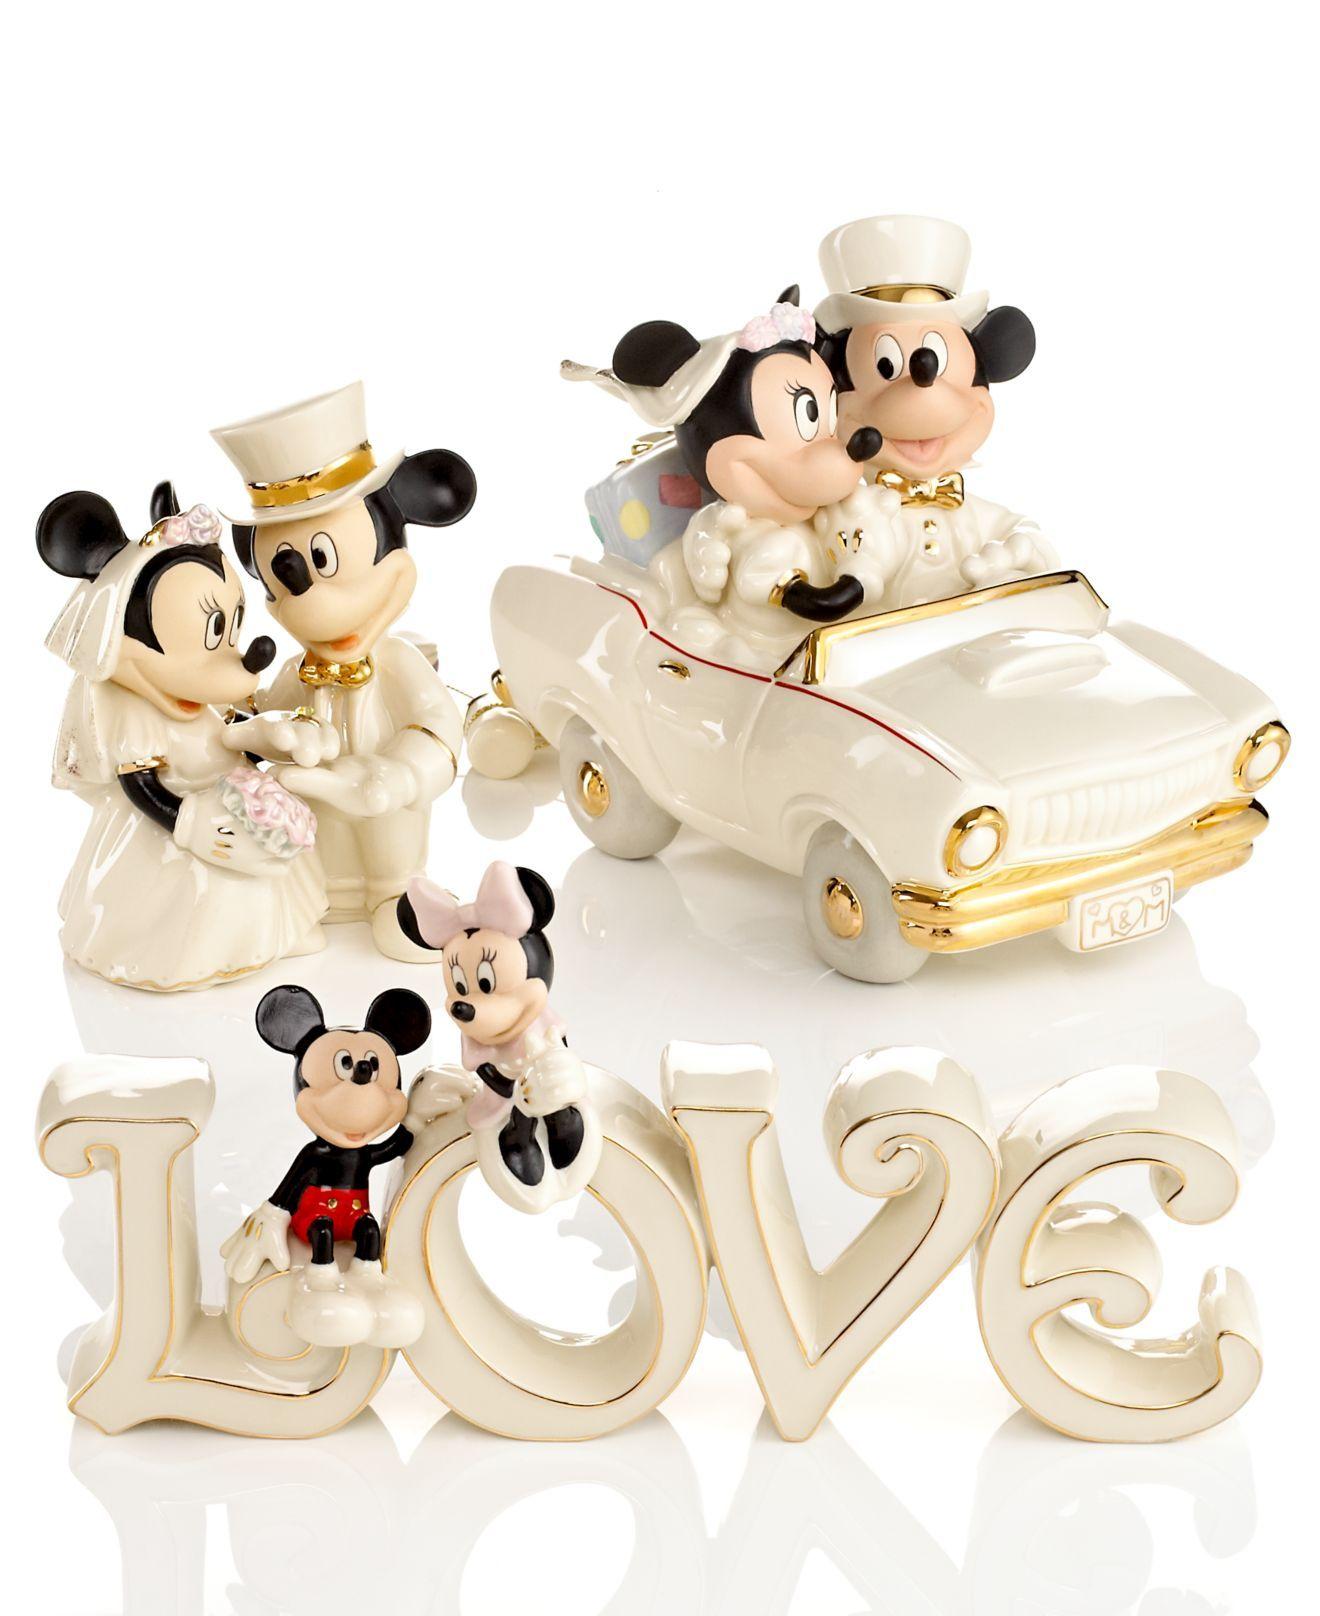 ad25f1b0d15b Lenox Collectible Disney Figurines